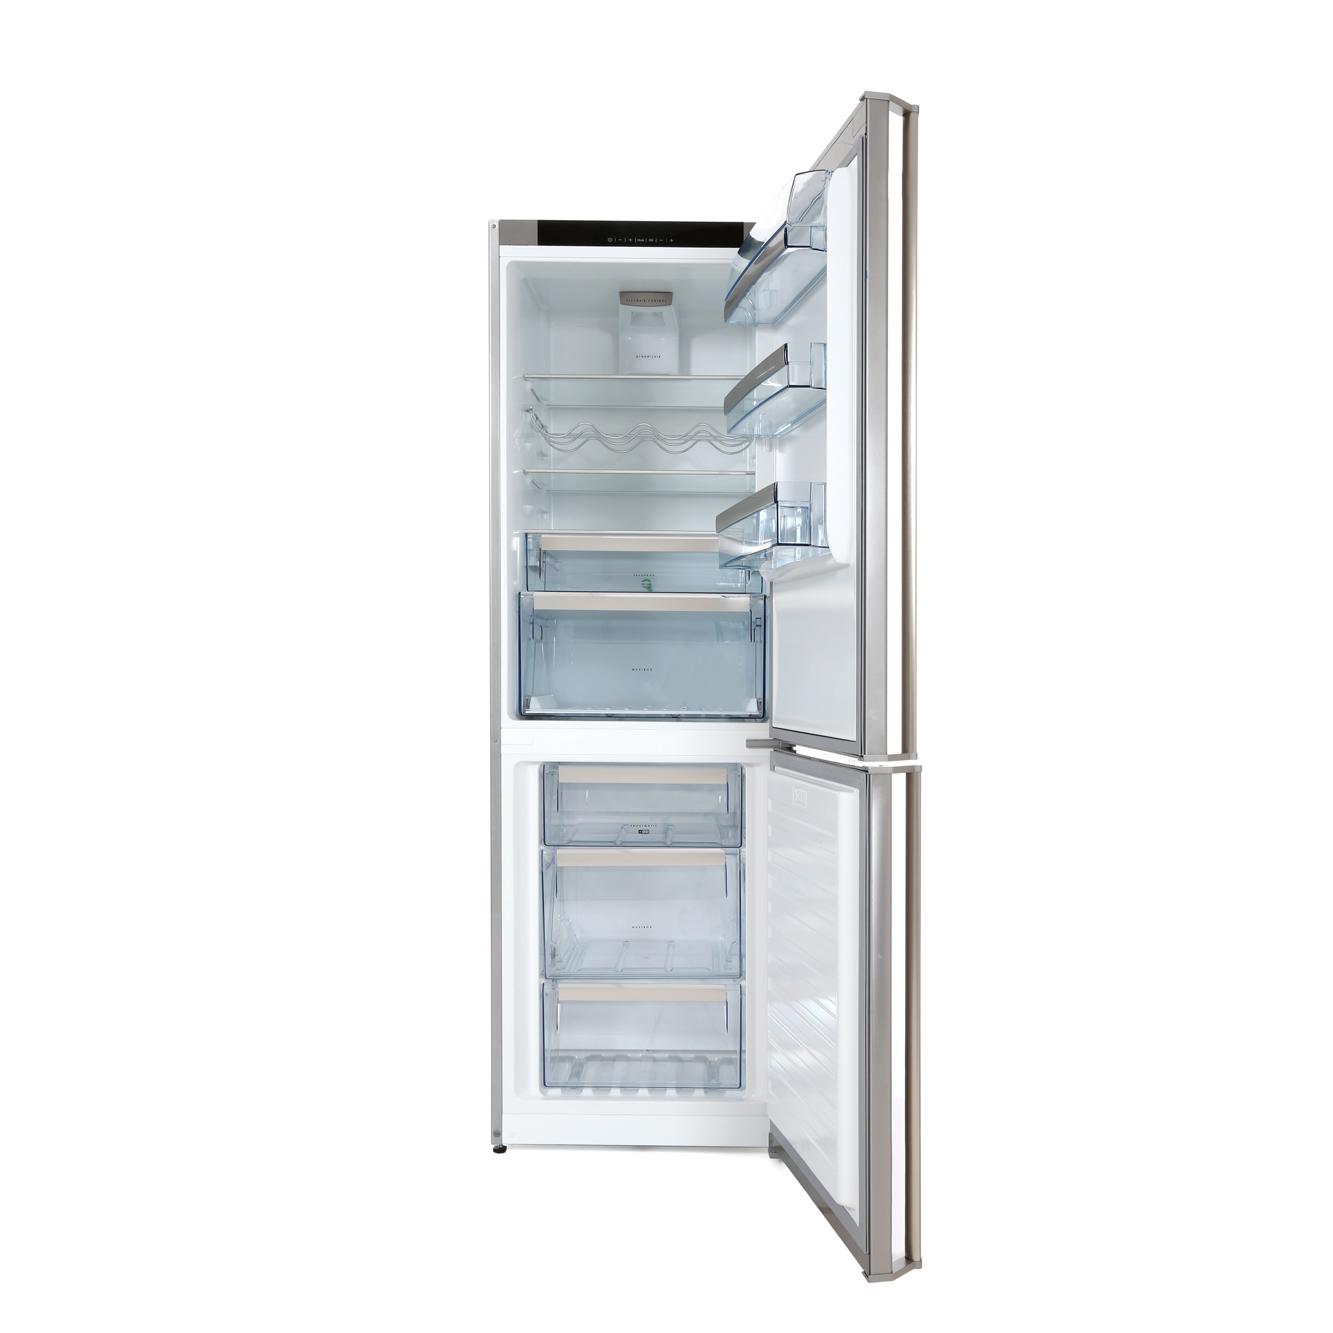 Aeg S83420ctx2 Fridge Freezer Stainless Steel Door With